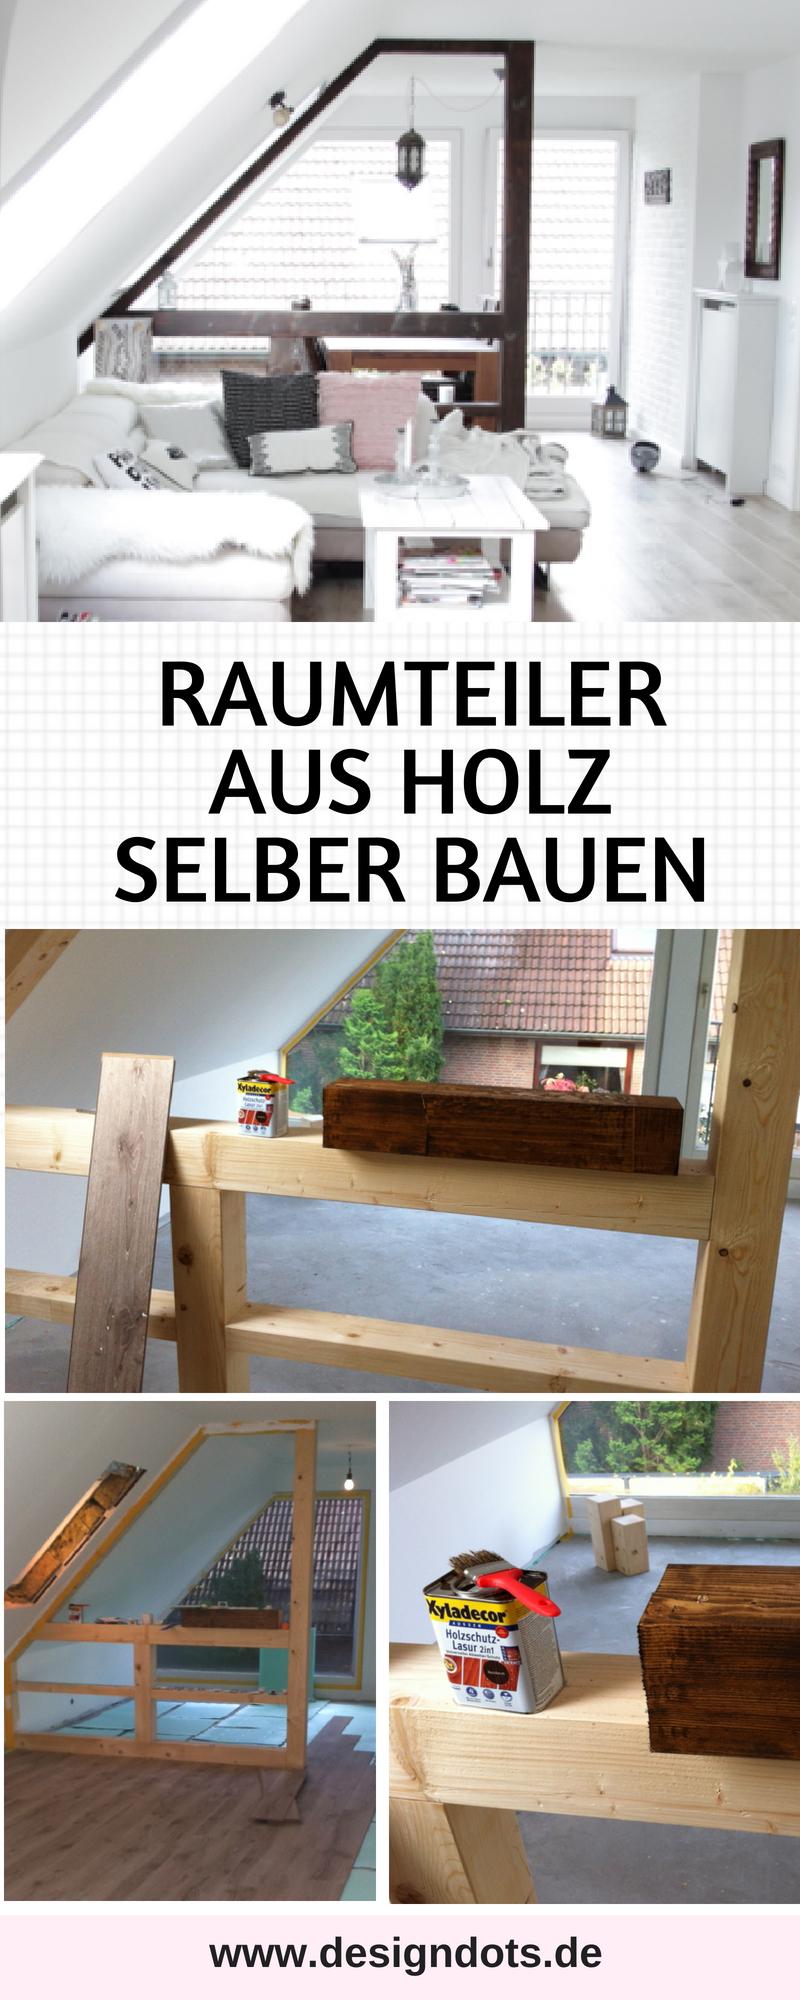 Raumteiler Holz Fachwerkoptik Selbst Bauen Design Dots